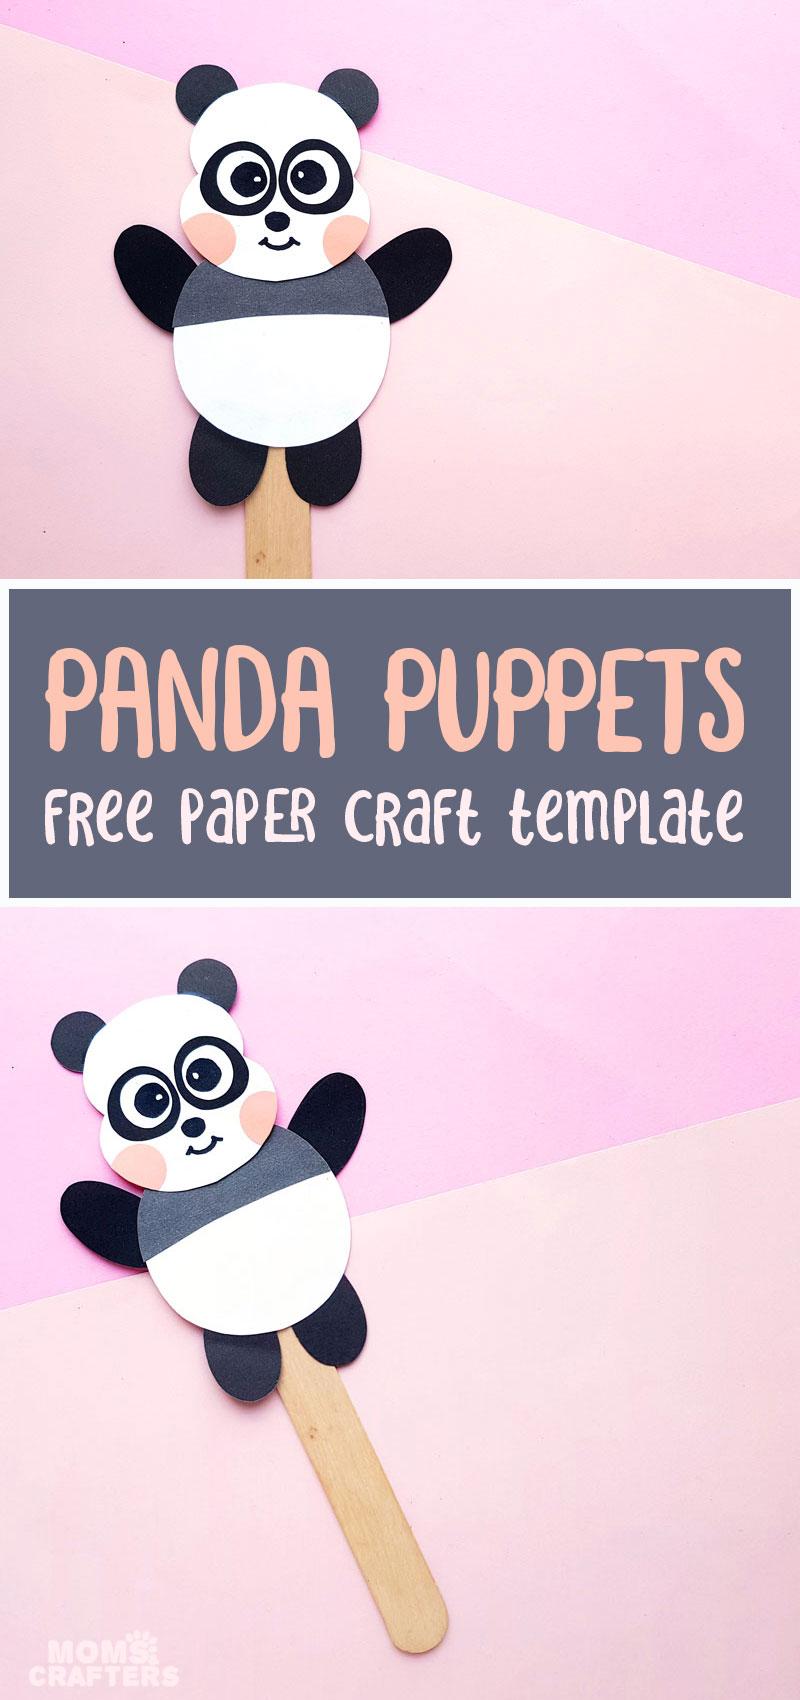 Paper panda craft - tmeplate